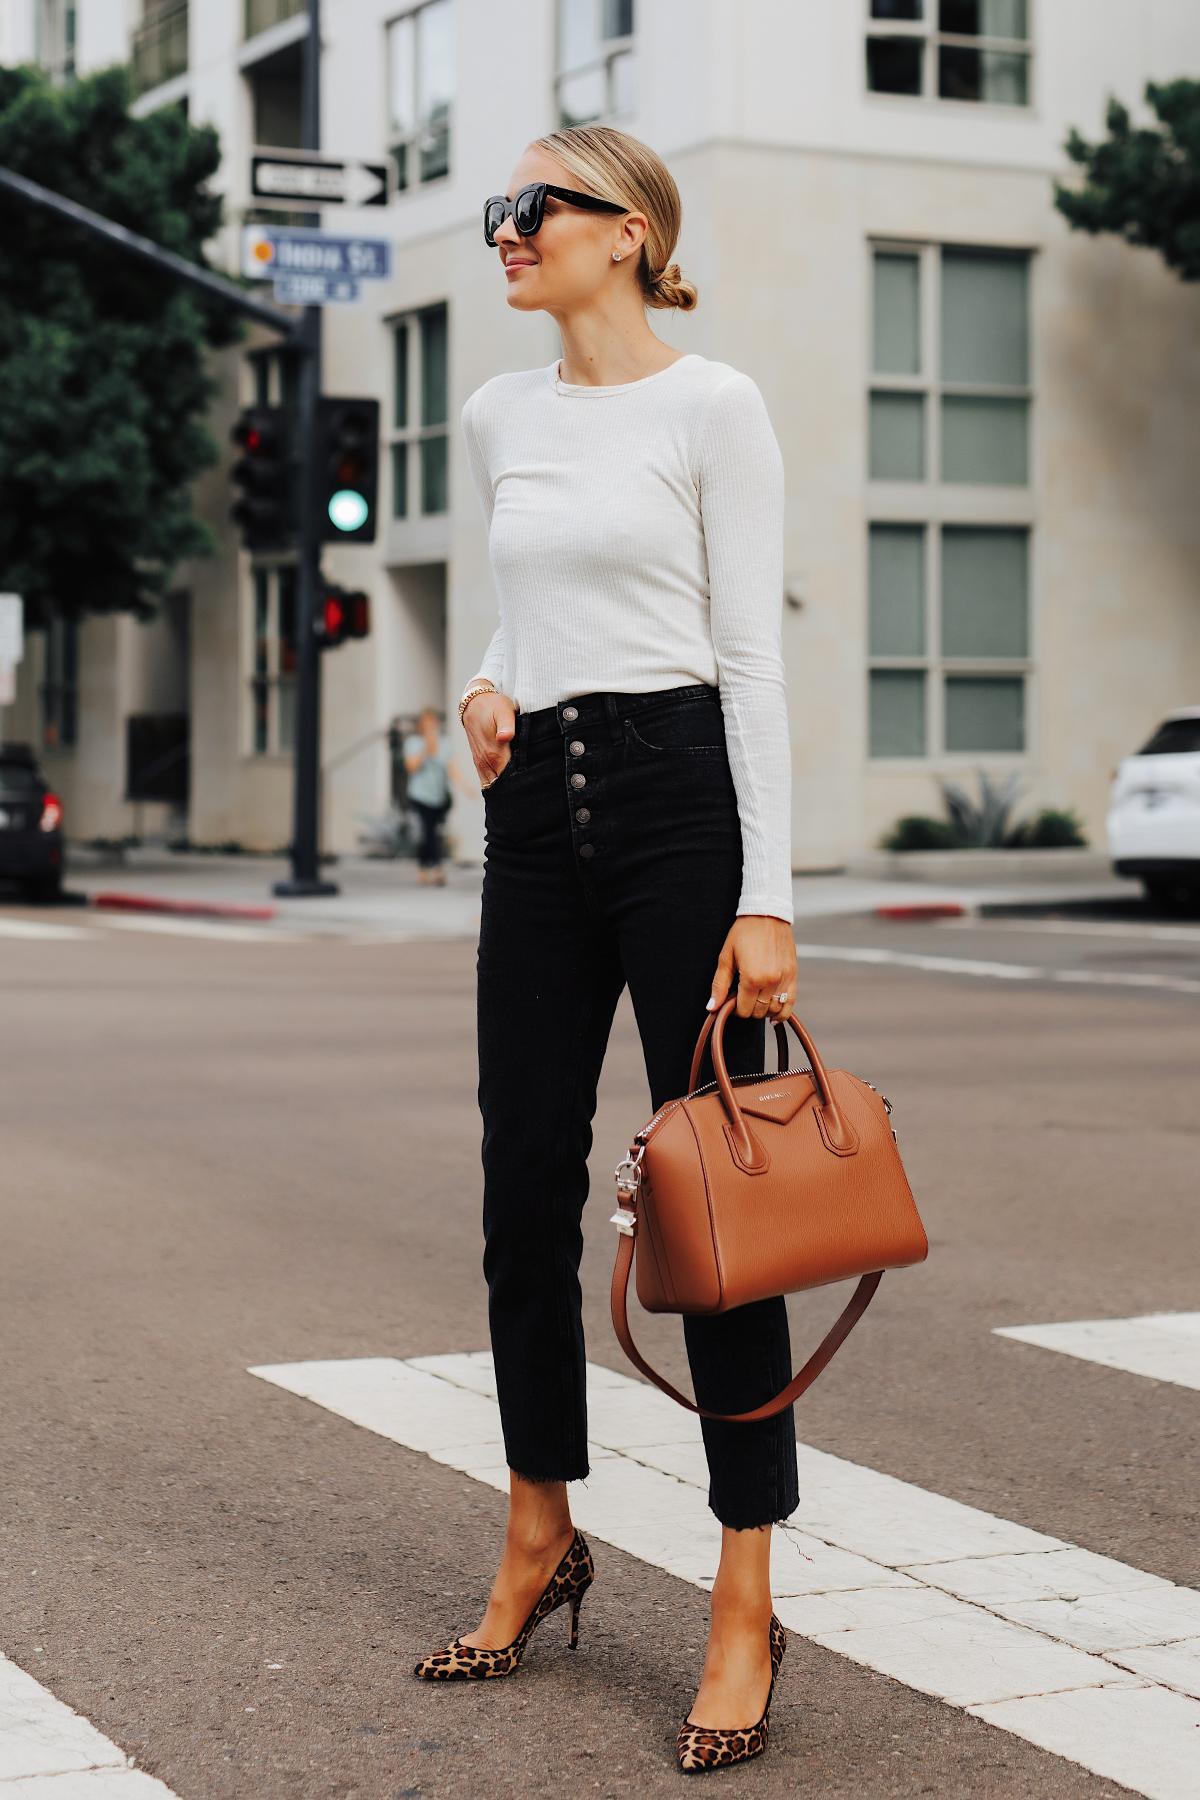 Fashion Jackson Wearing White Long Sleeve Top Black Raw Hem Jeans Leoaprd Pumps Givenchy Antigona Cognac Handbag